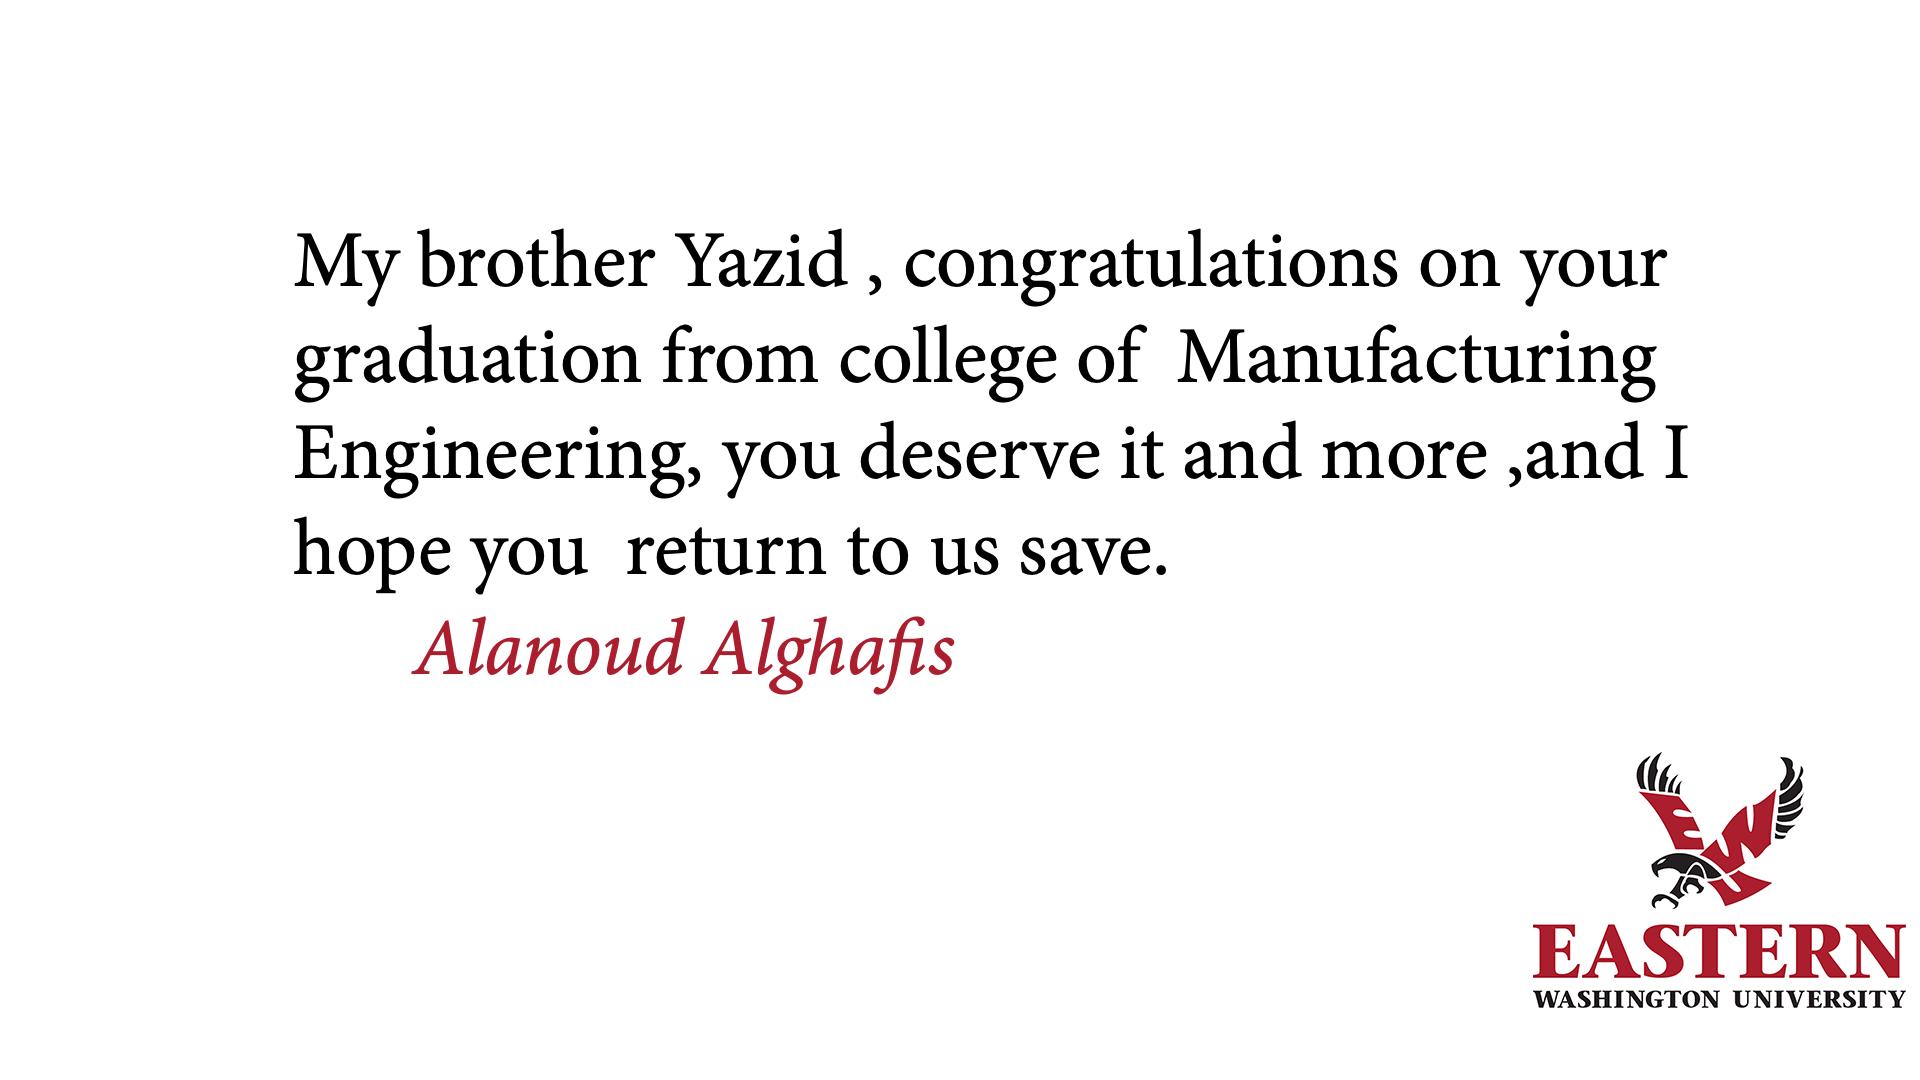 tbi_yazid-abdullah-a-alghafis_6776.png